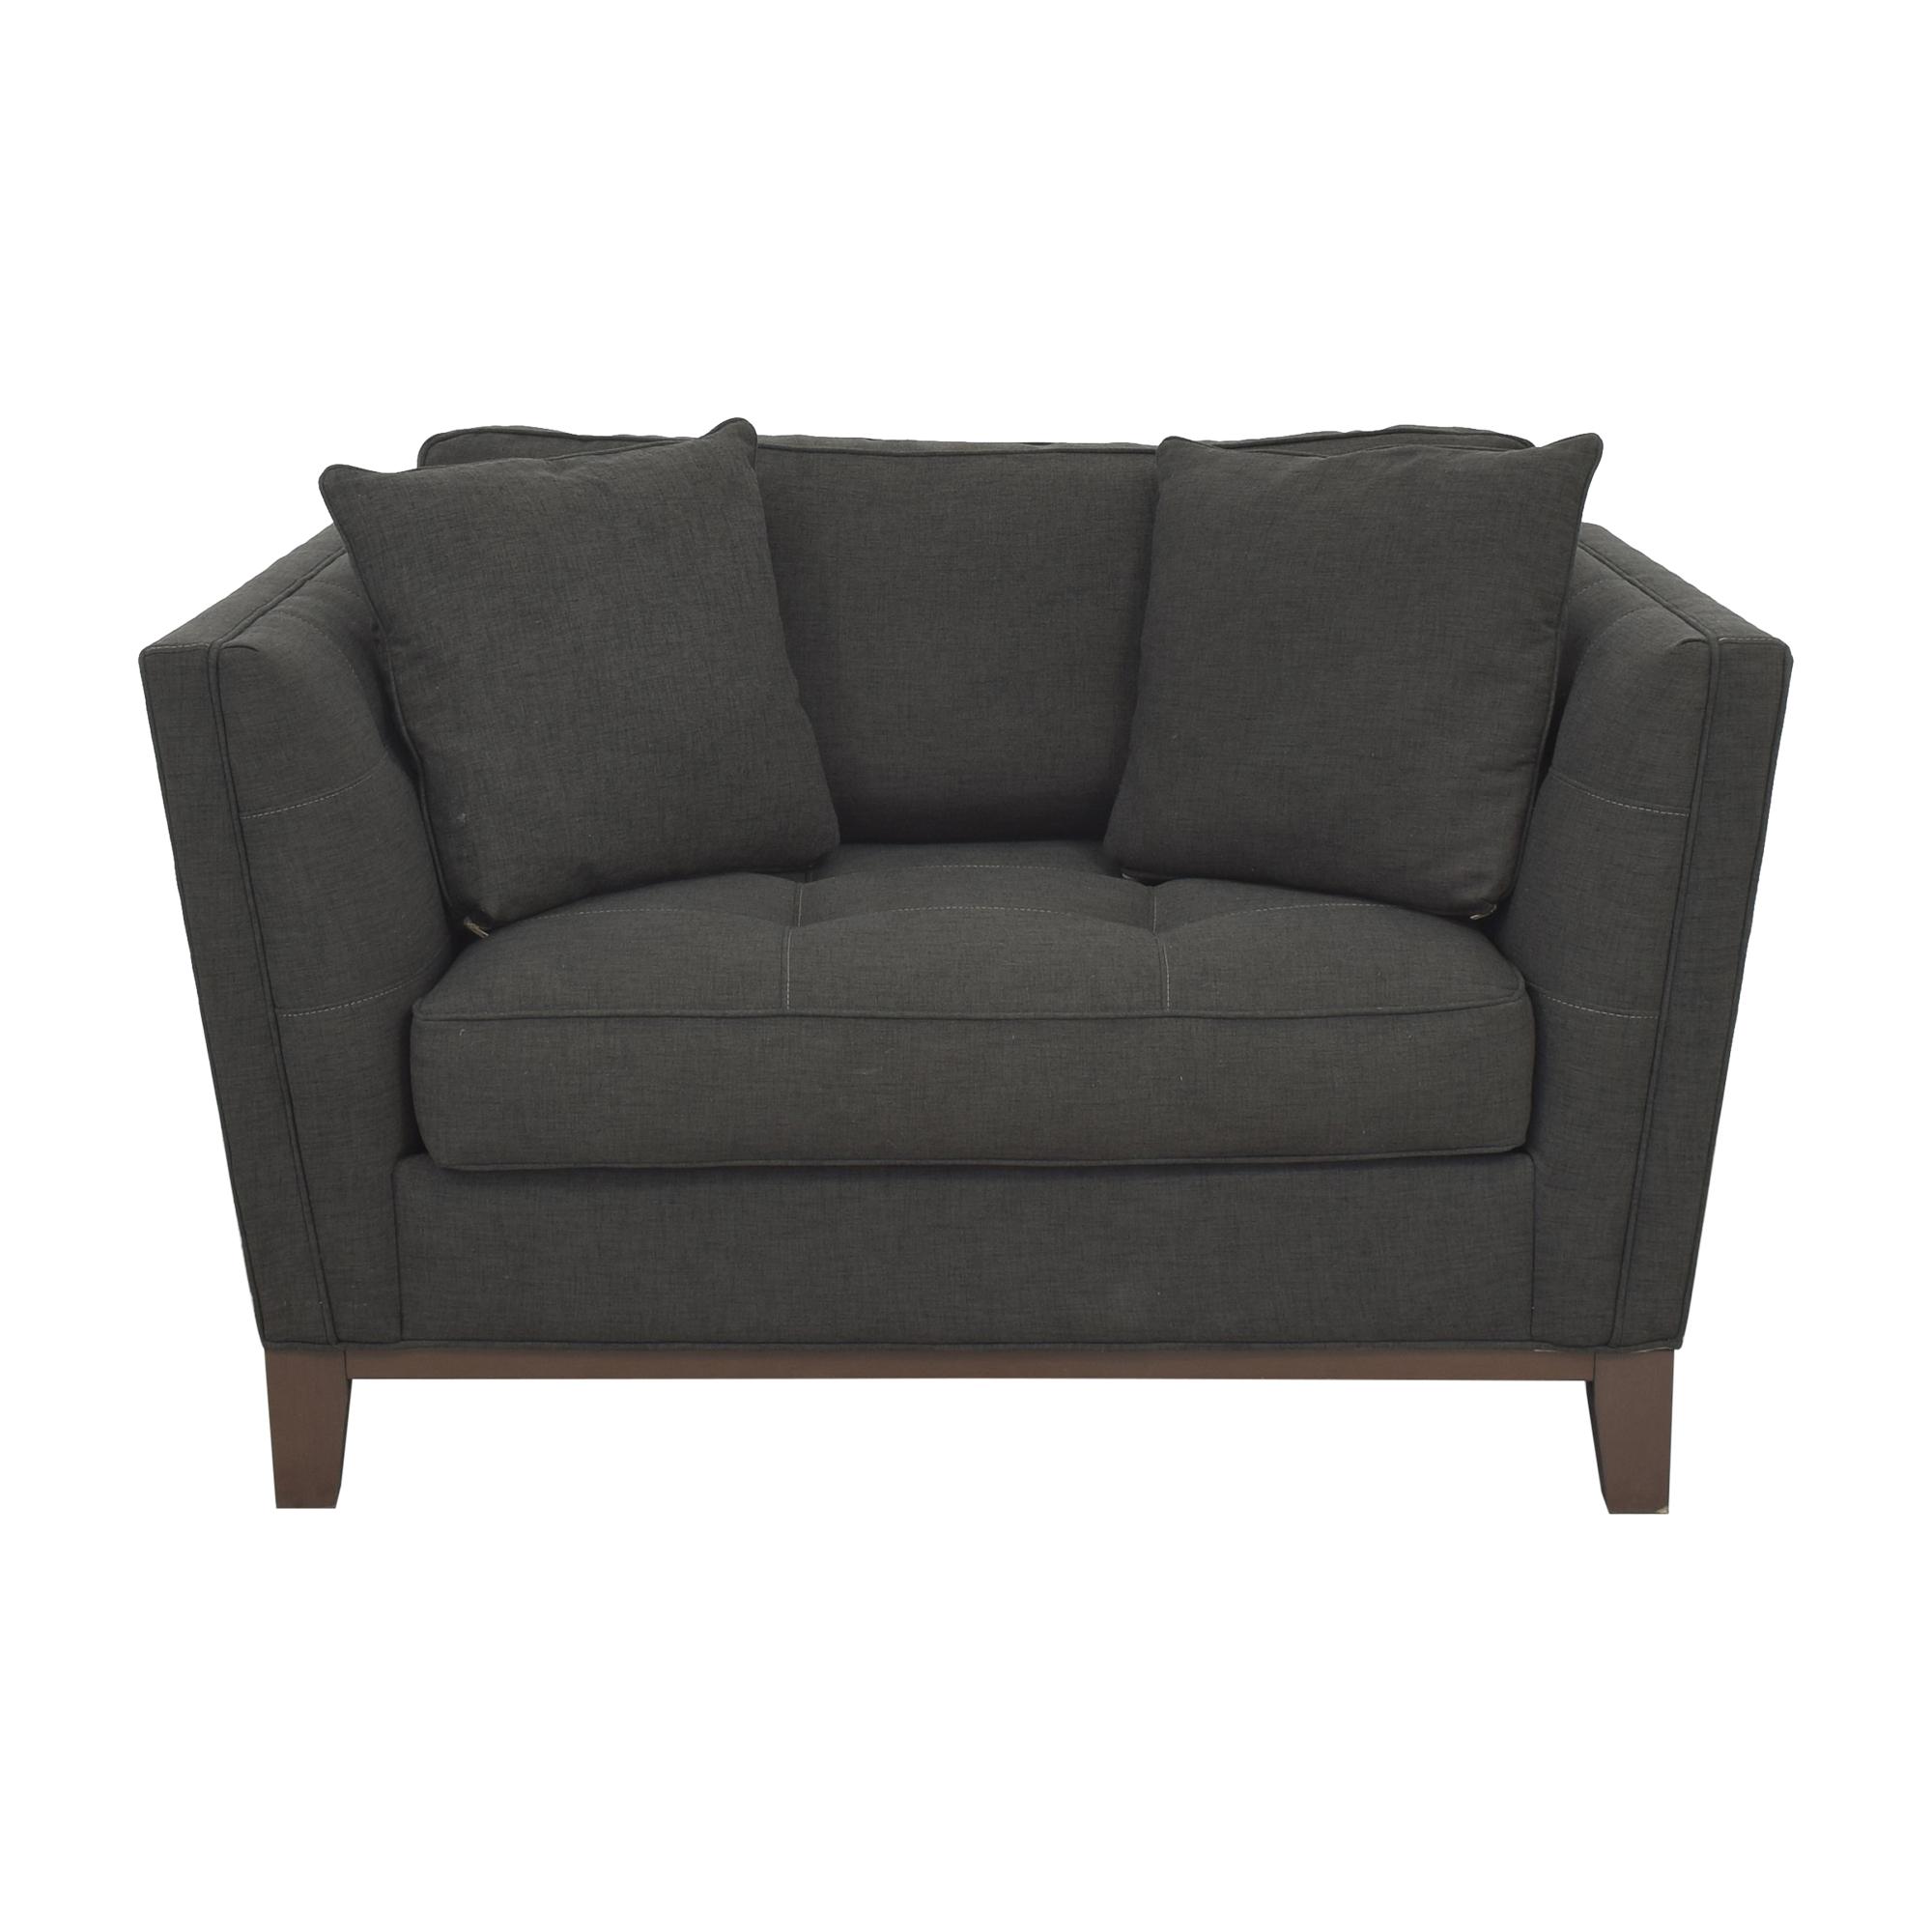 buy Raymour & Flanigan Macauley Chair-and-a-Half Raymour & Flanigan Sofas